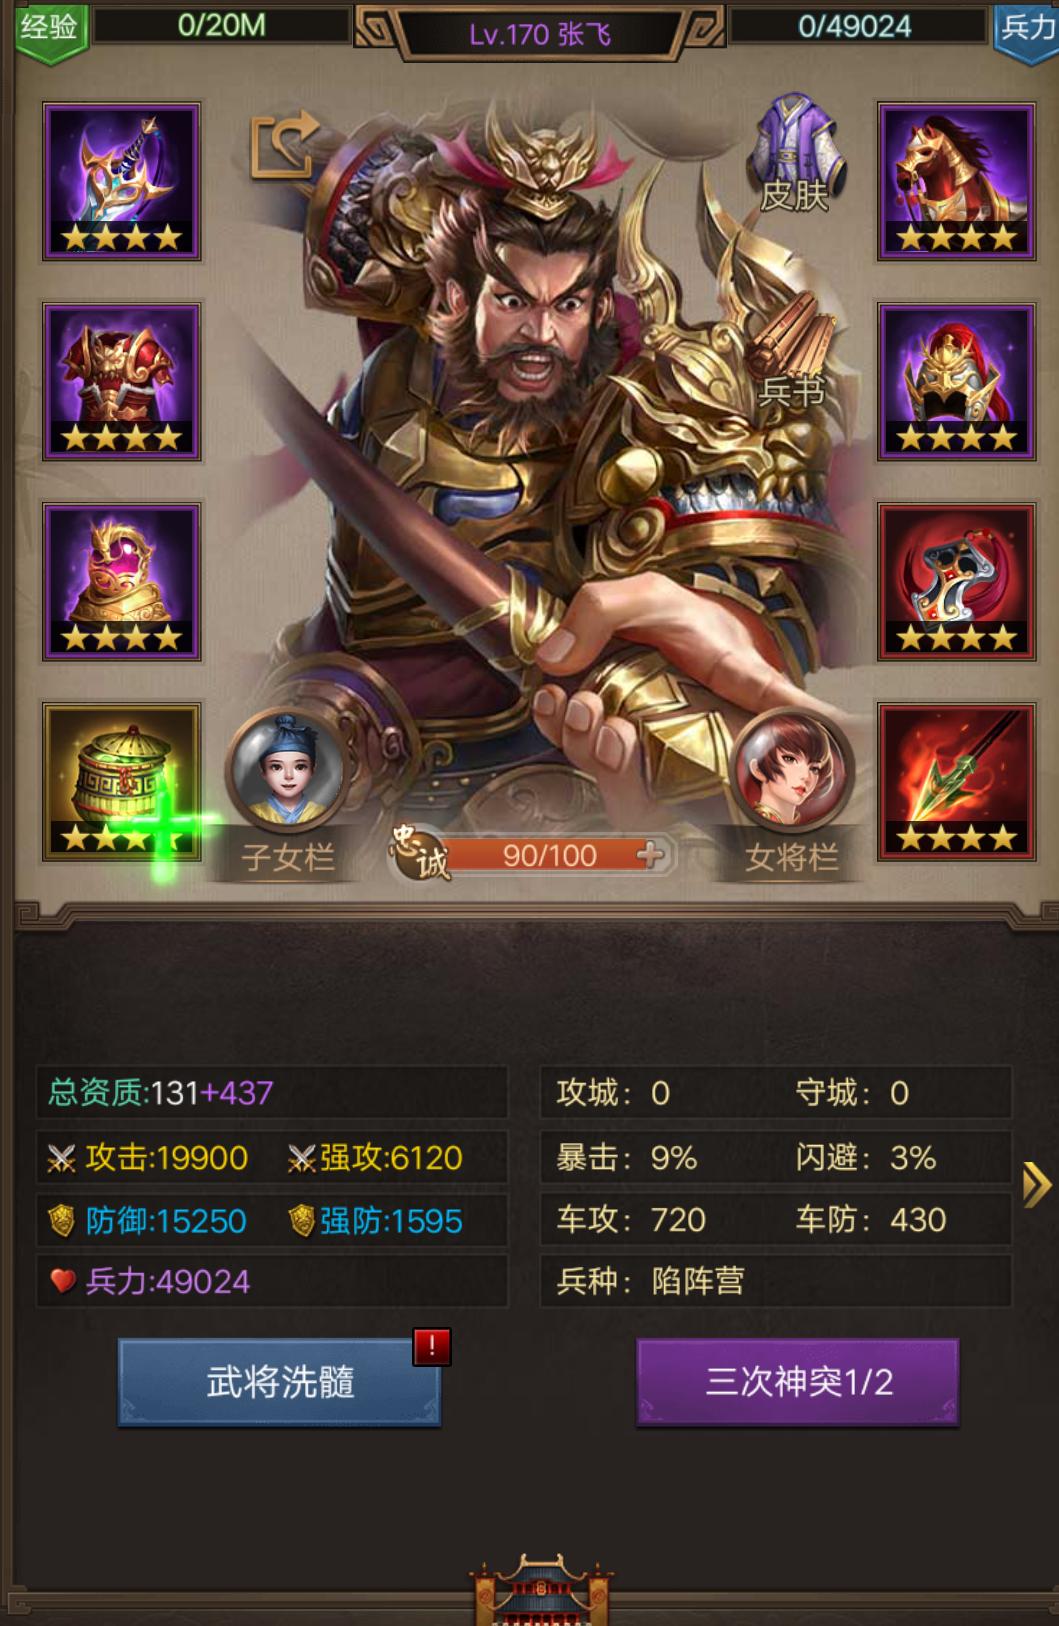 Screenshot_2019_1101_190050.png